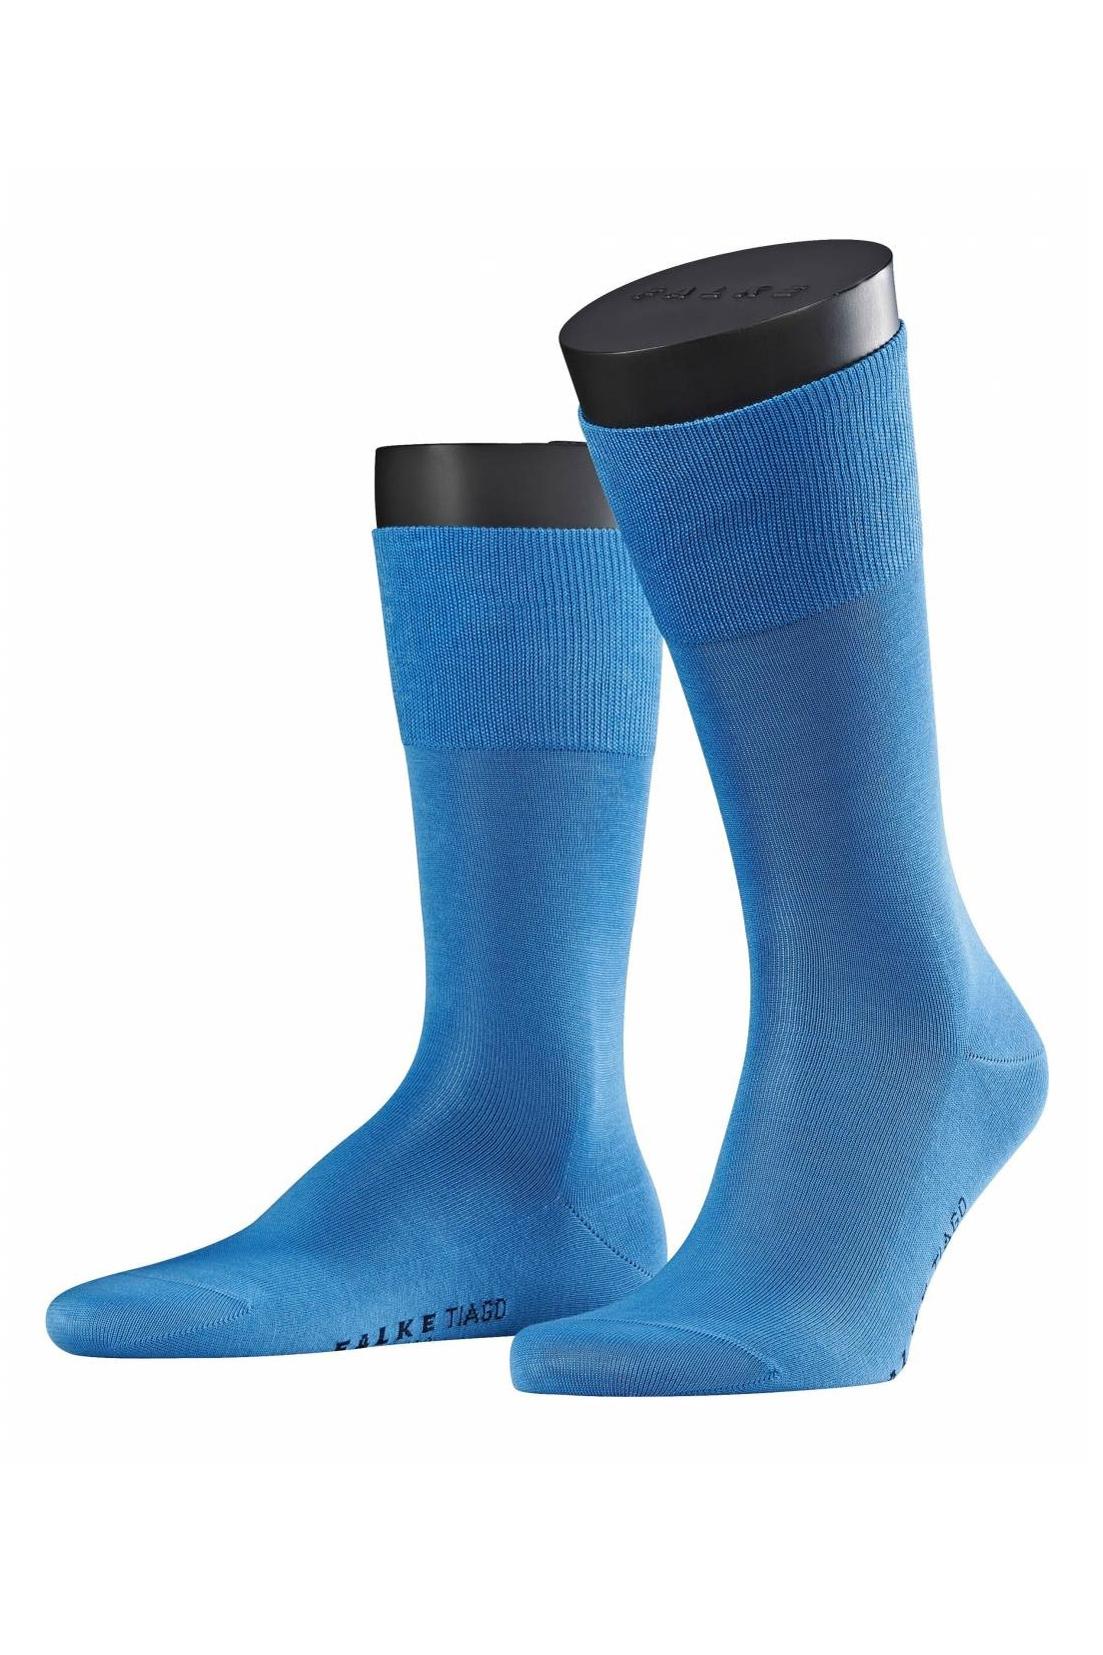 FALKE Tiago - Ciorap albastru